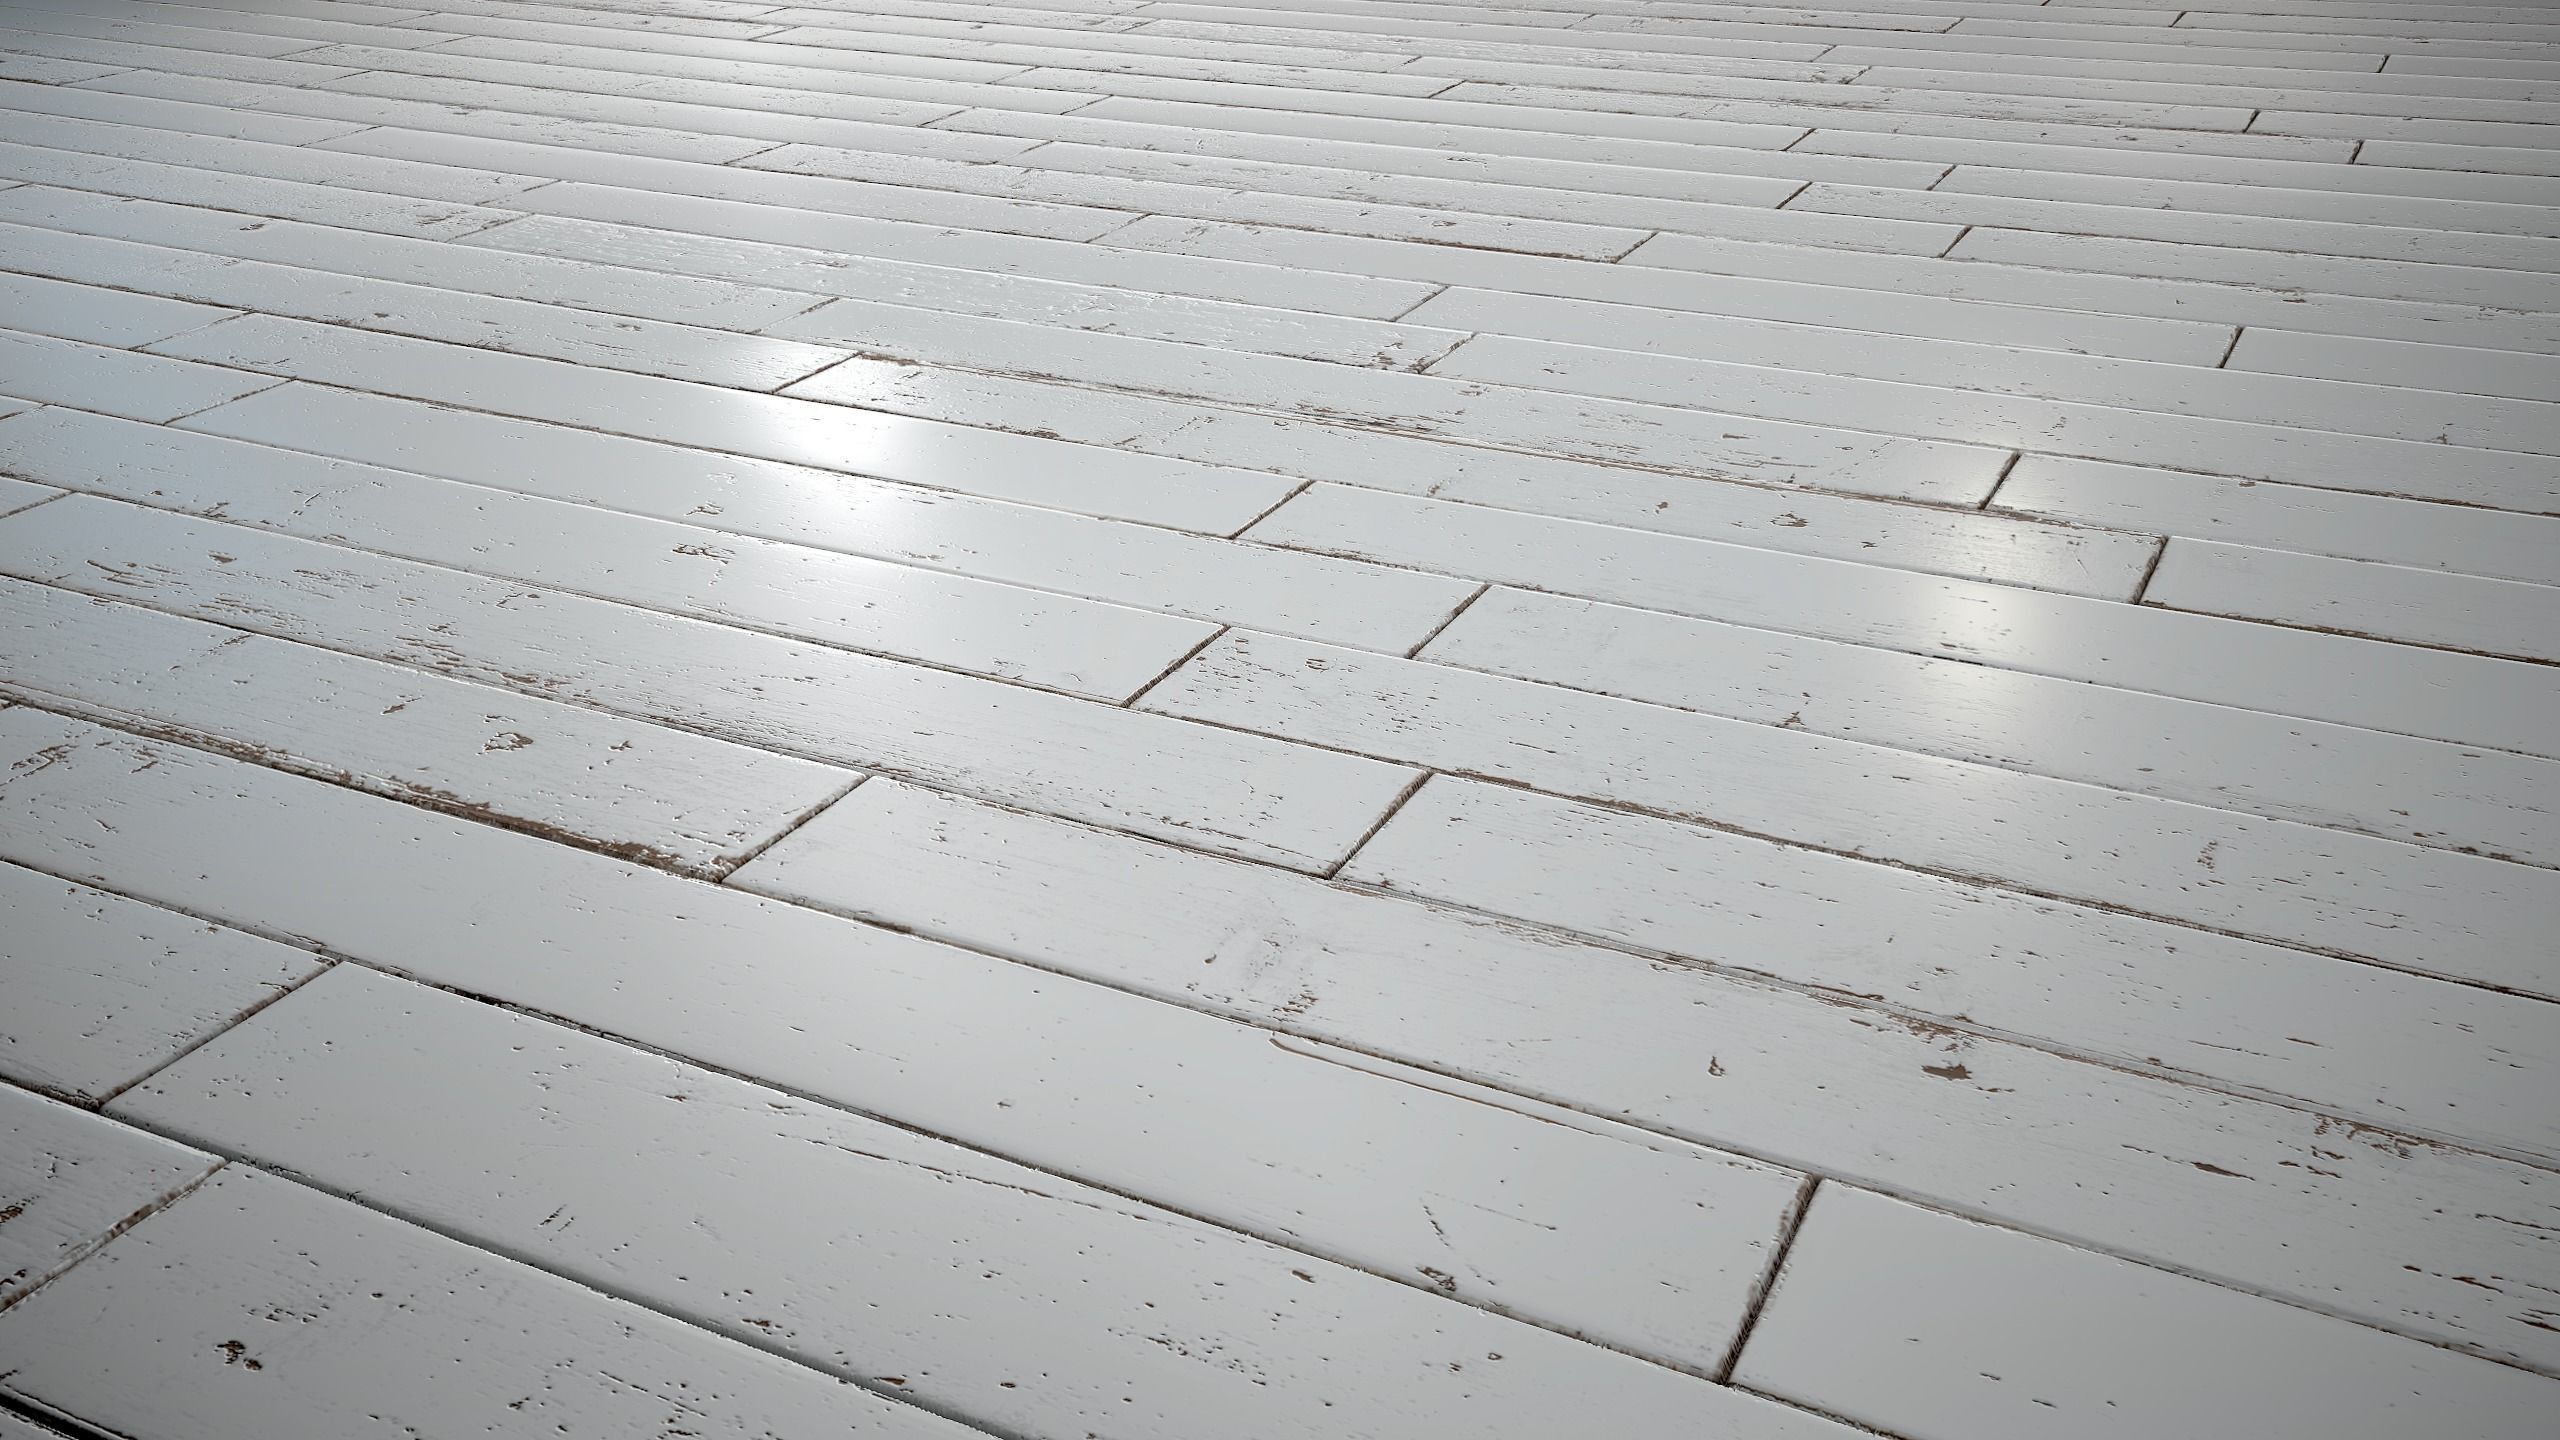 White Painted woodstrip parquet - PBR textures